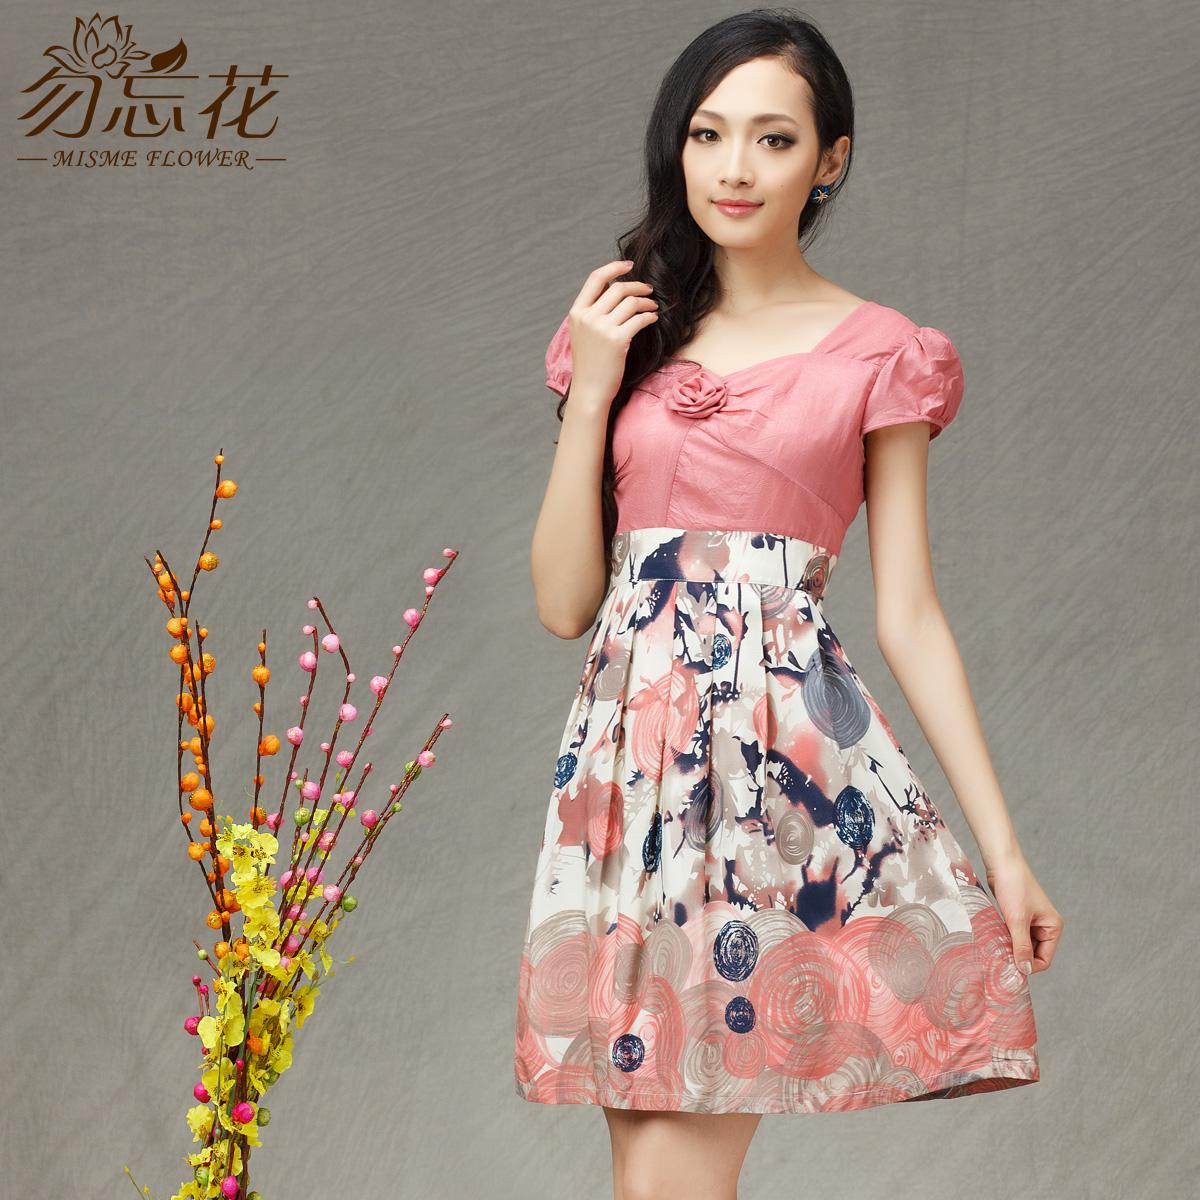 Women fashion dress photo